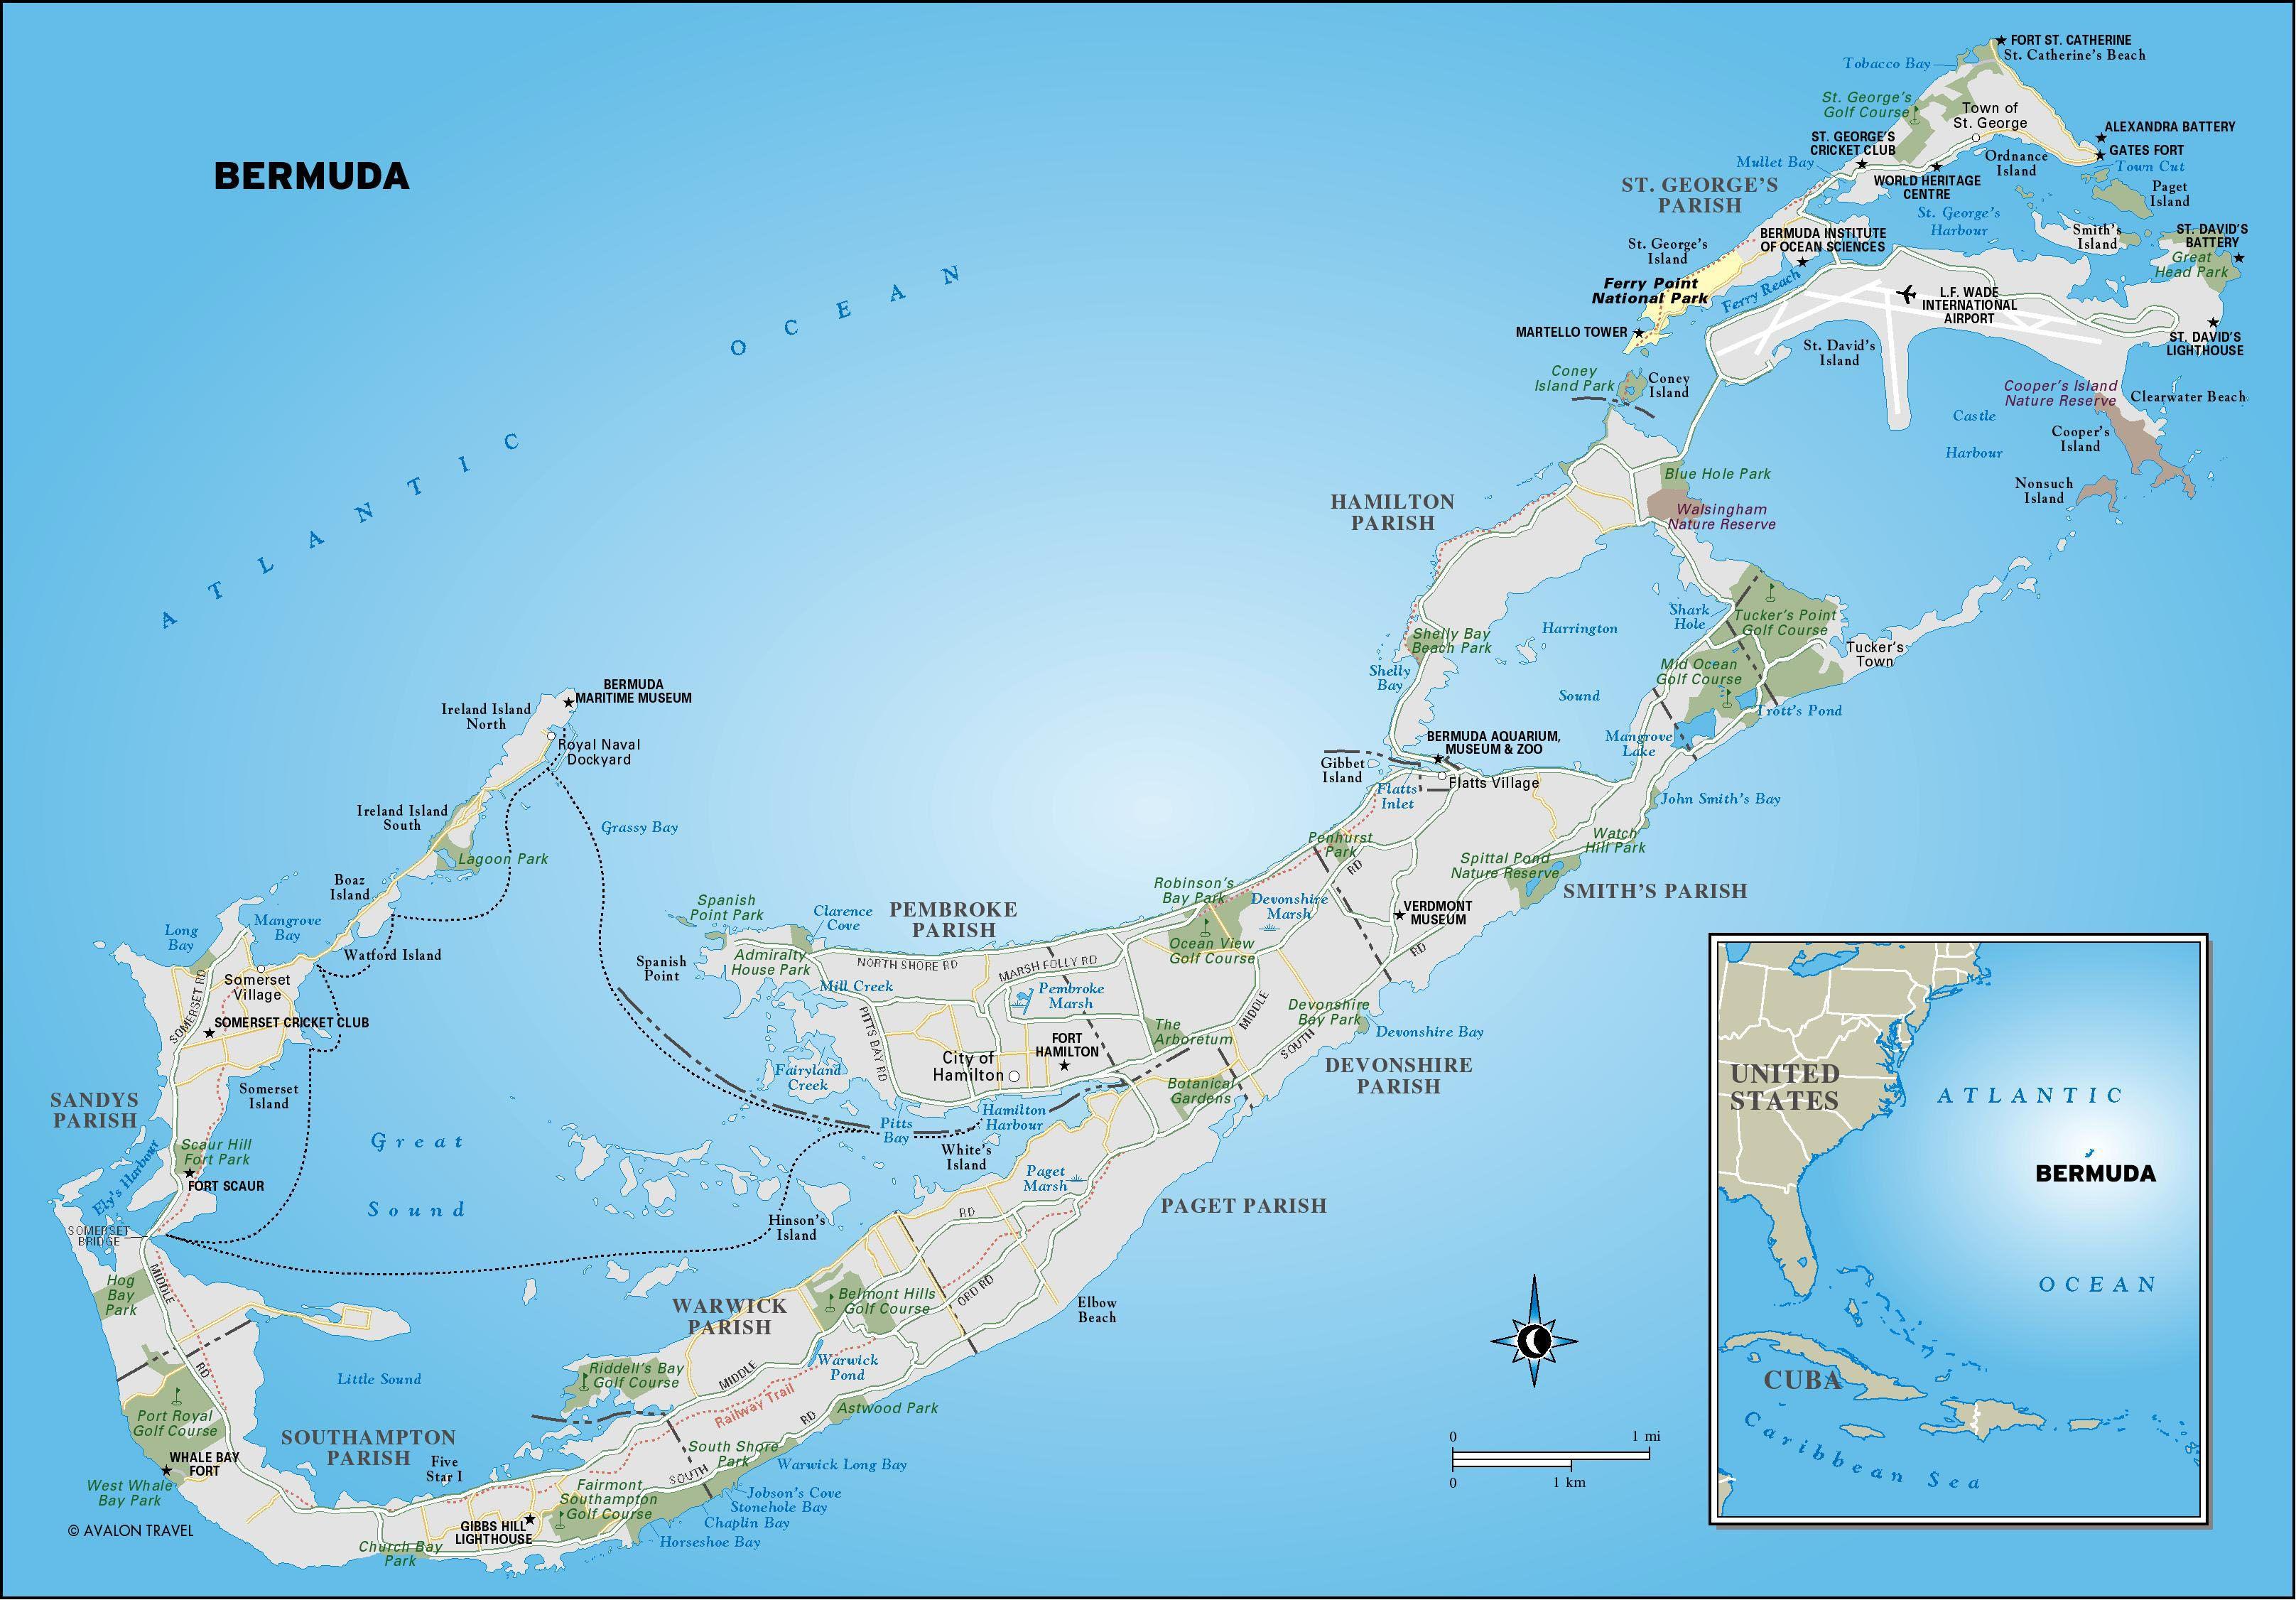 Bermuda | Bermuda vacations, Travel maps, Singles cruise